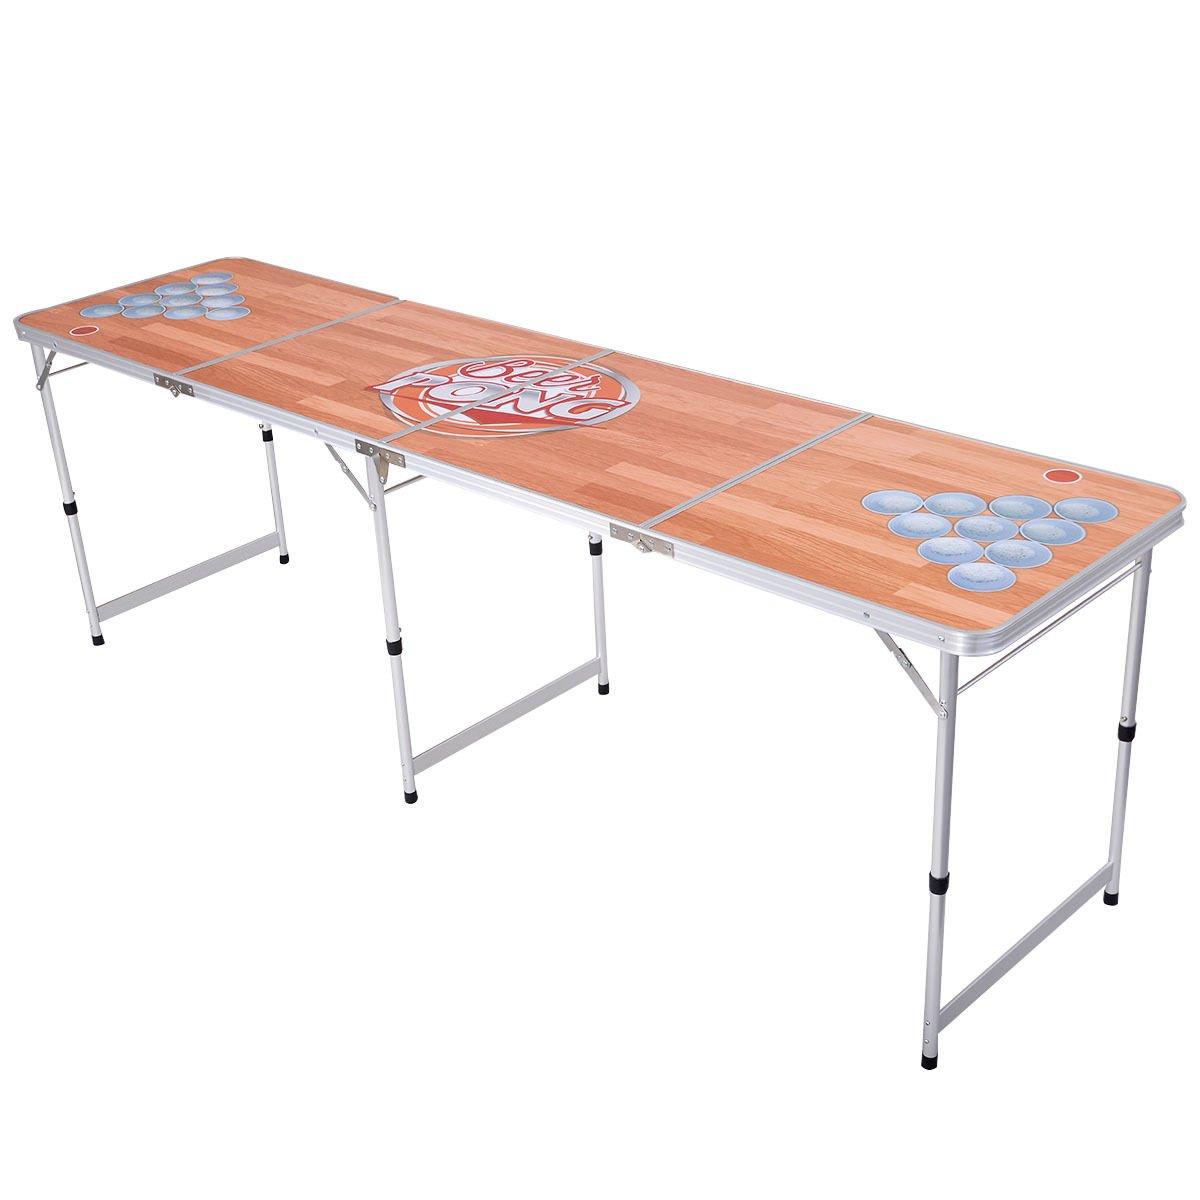 Tek Widget Portable Foldable Aluminum 8FT Folding Beer Pong Table